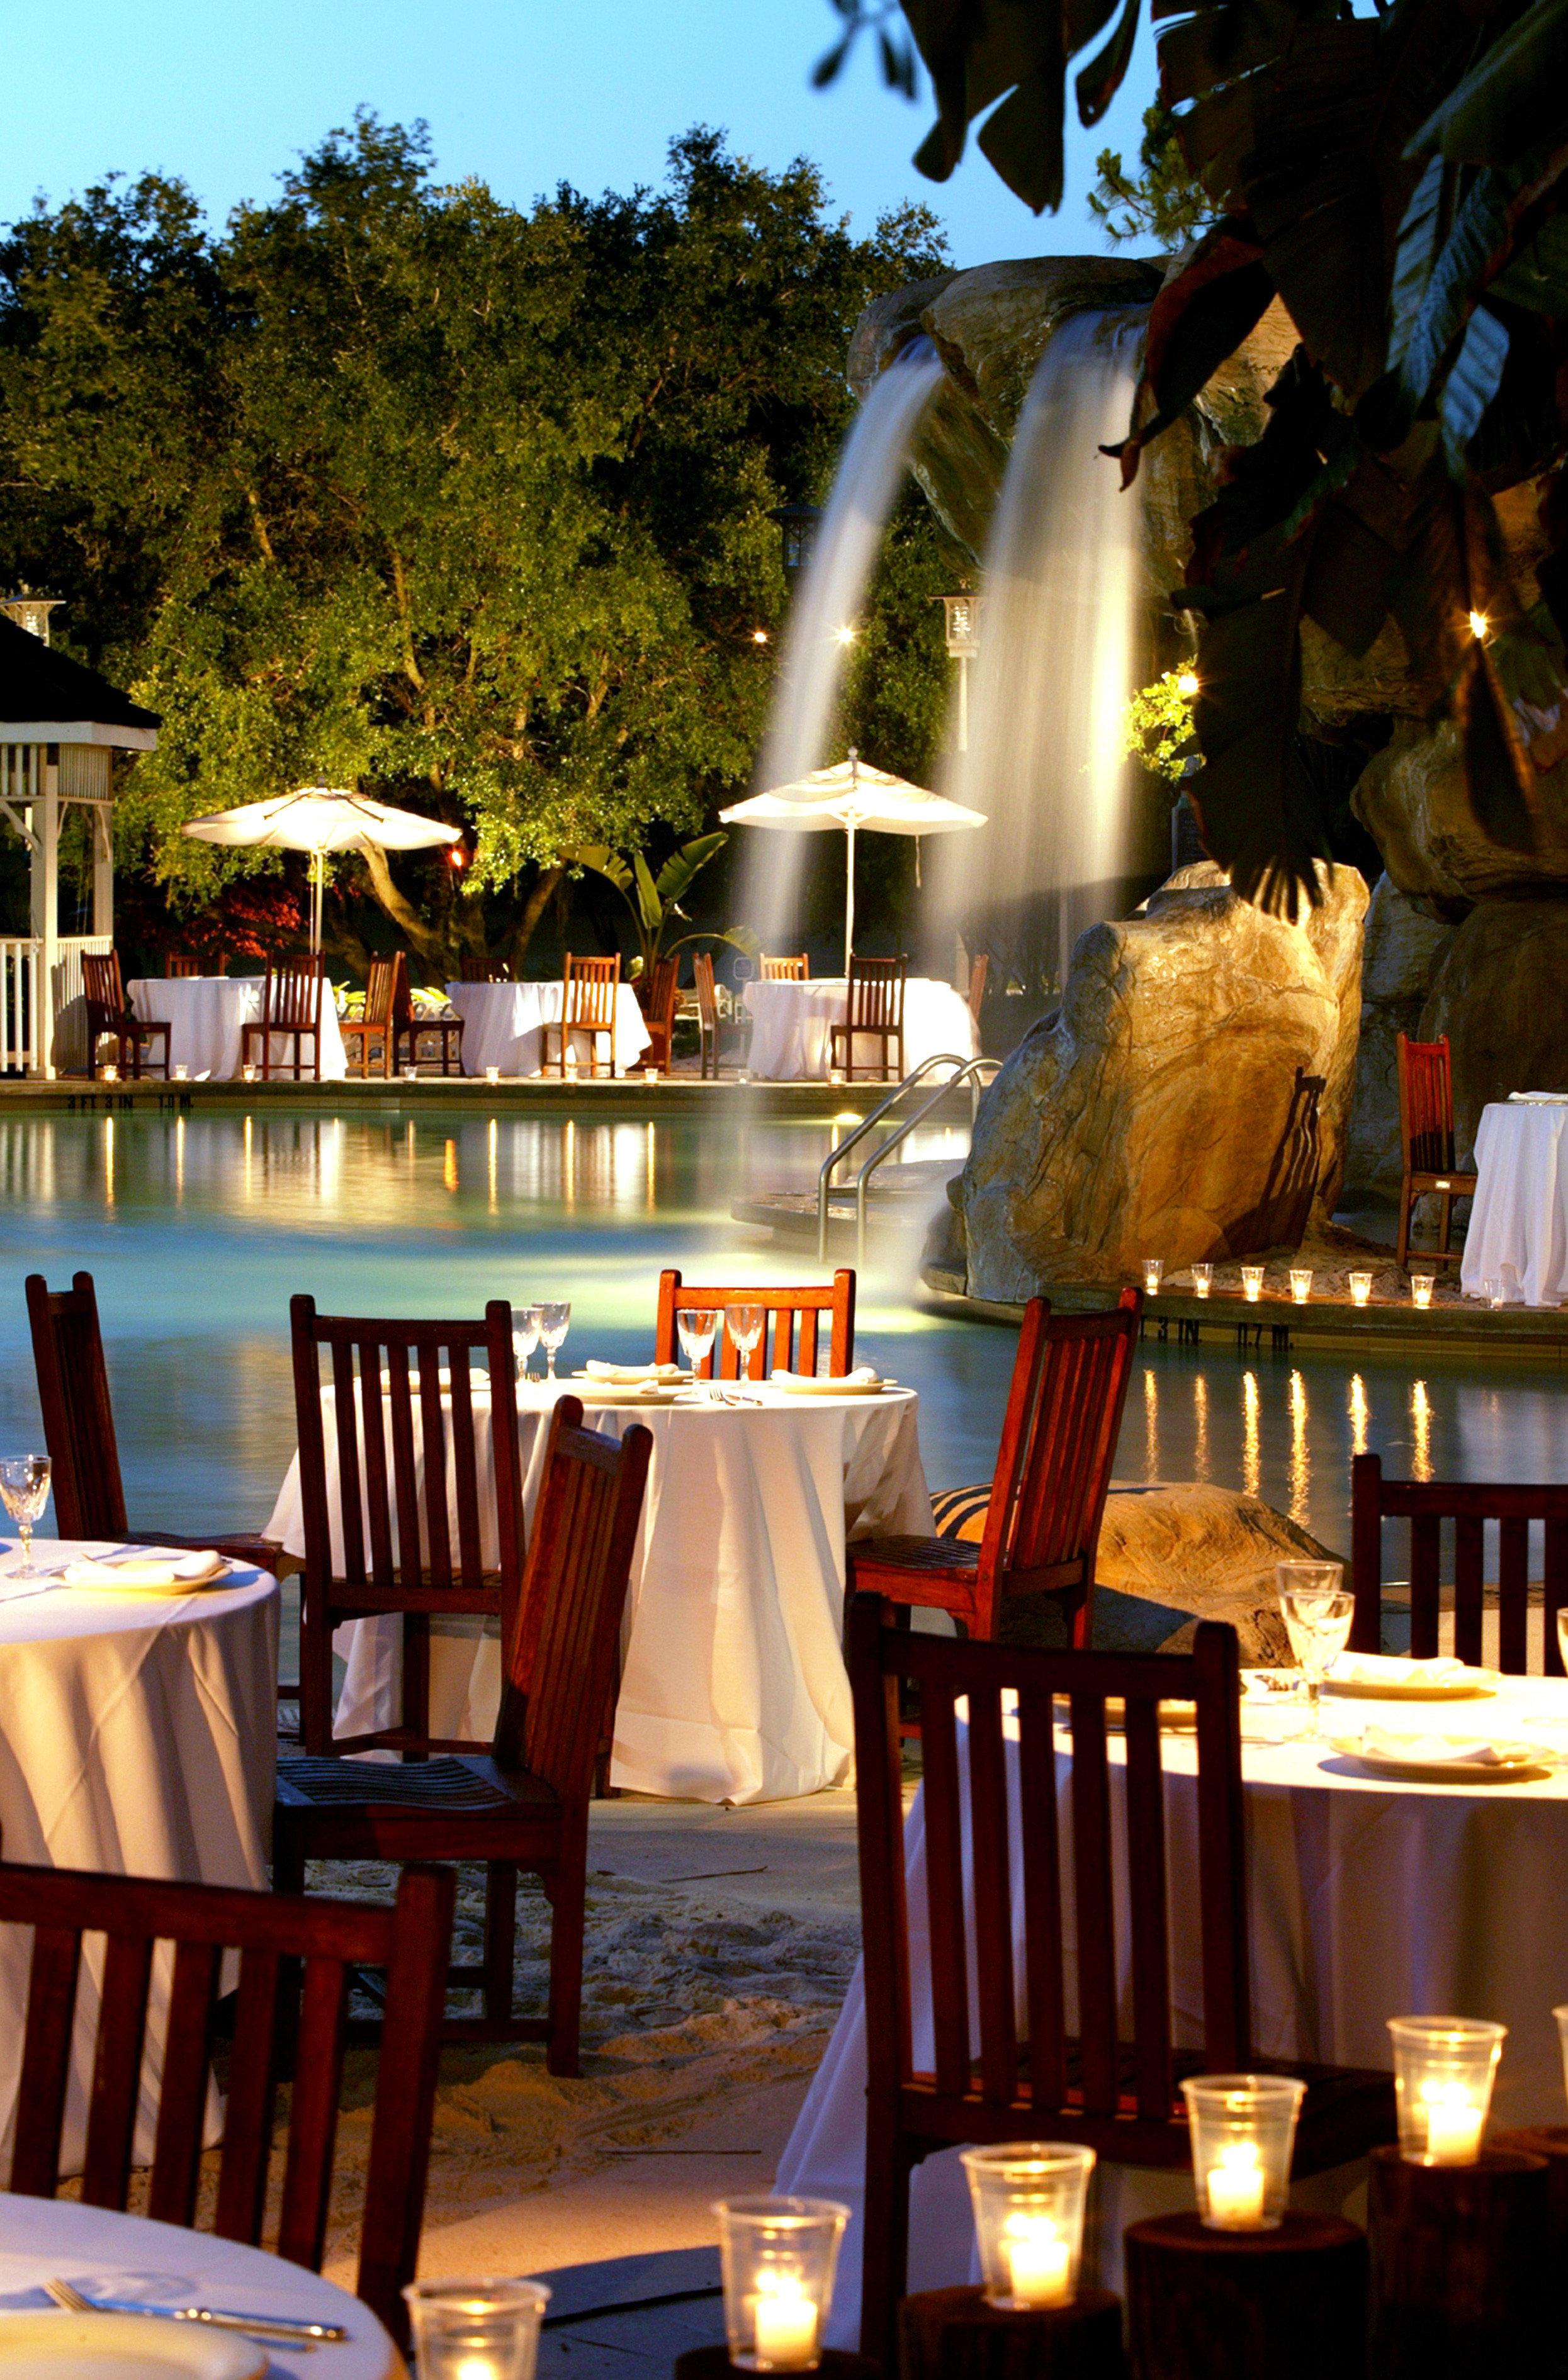 Bar Dining Drink Eat Elegant tree chair restaurant Resort set dining table